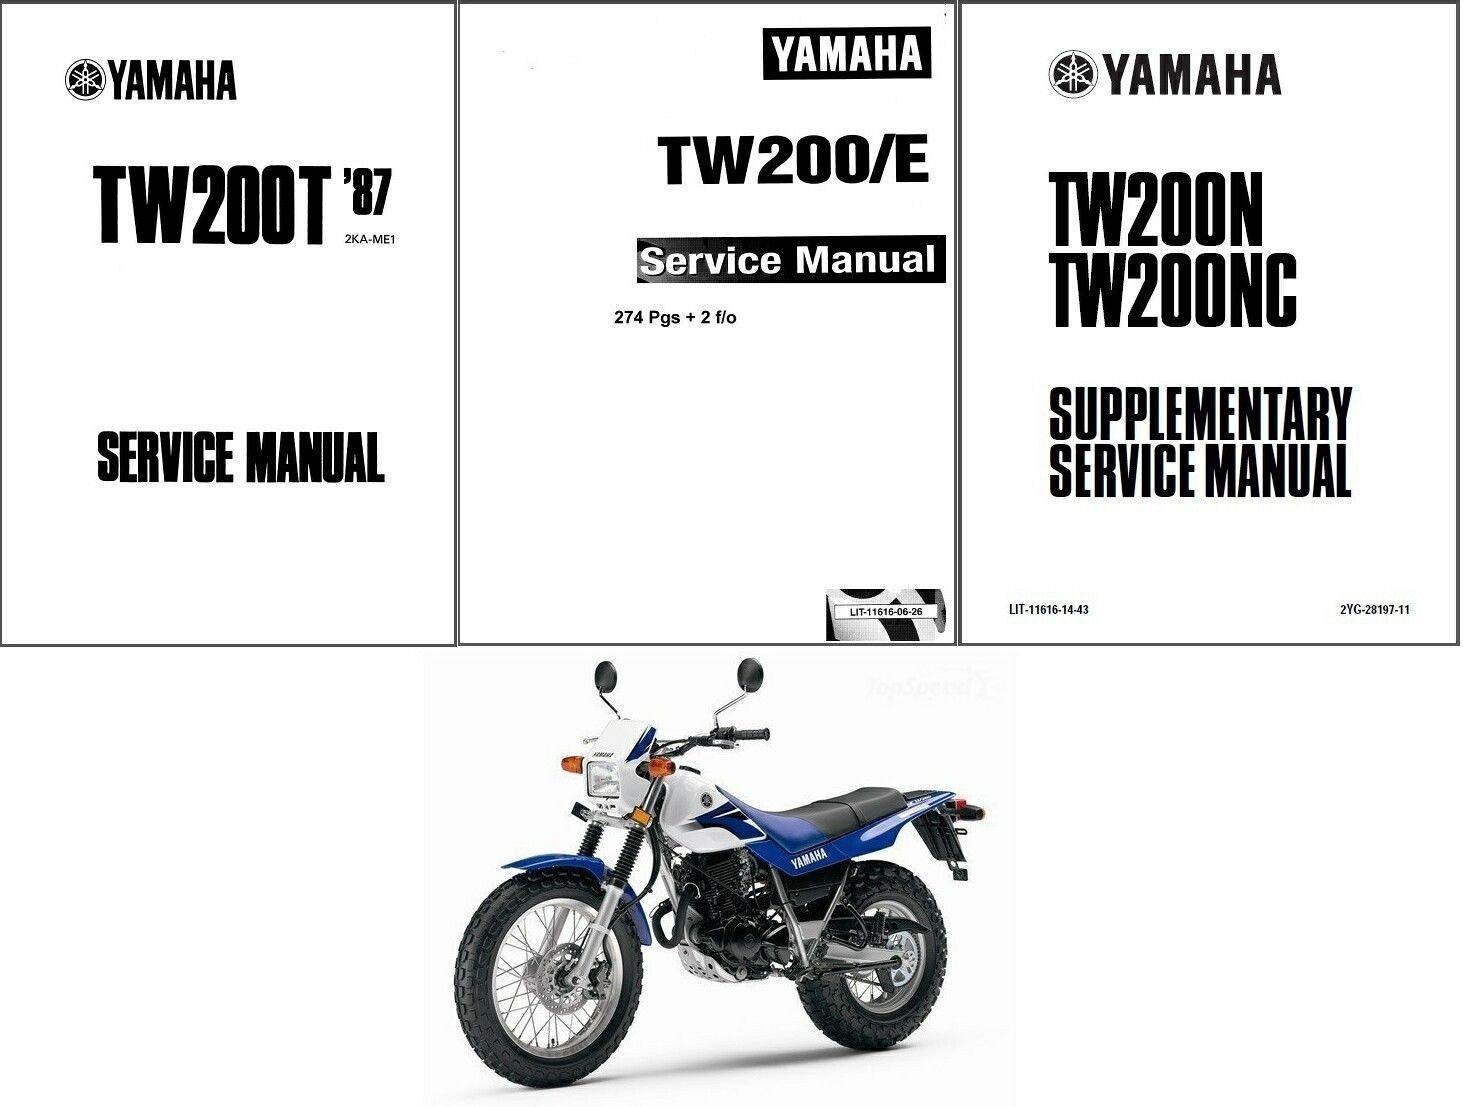 87 14 yamaha tw200 service repair workshop manual cd tw 200 for rh unisquare com 2008 Yamaha TW200 1987 yamaha tw200 repair manual